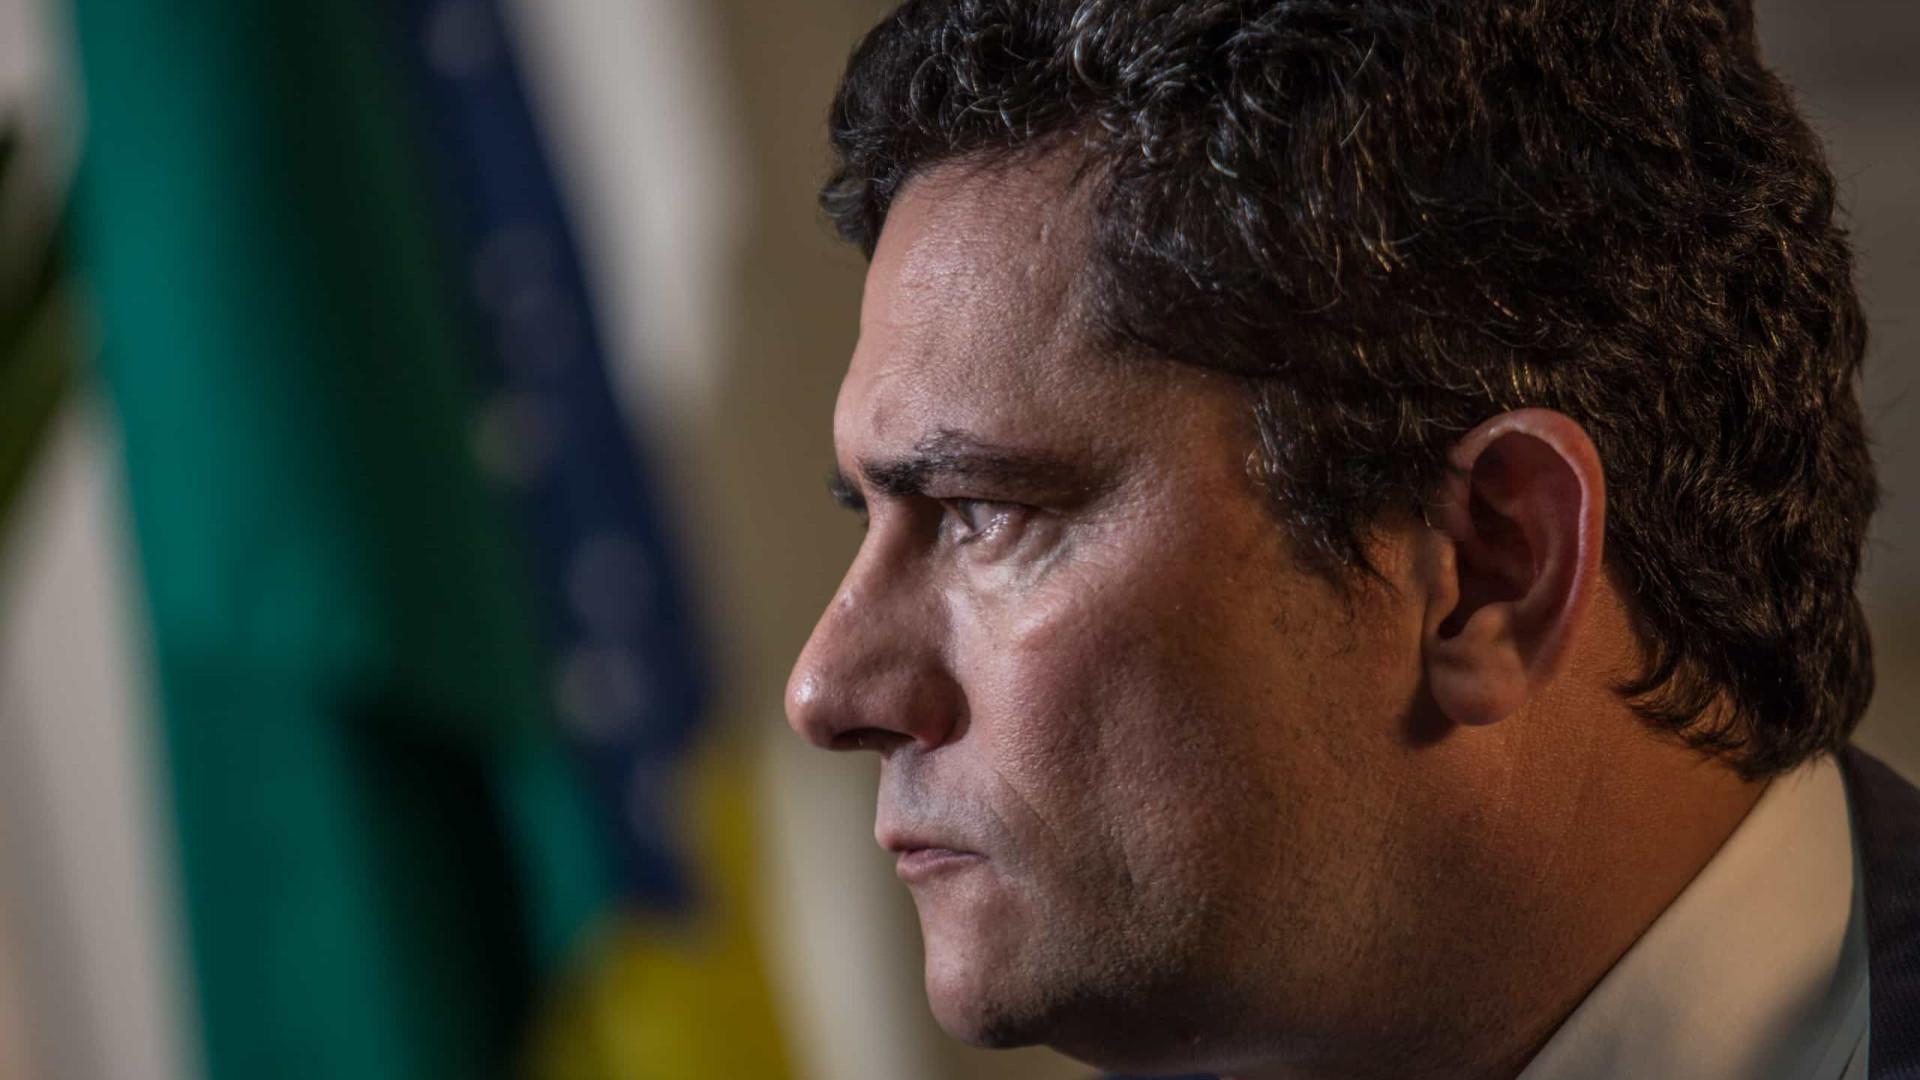 Ídolo dos antipetistas, Moro ameaça reino de Bolsonaro sobre a direita